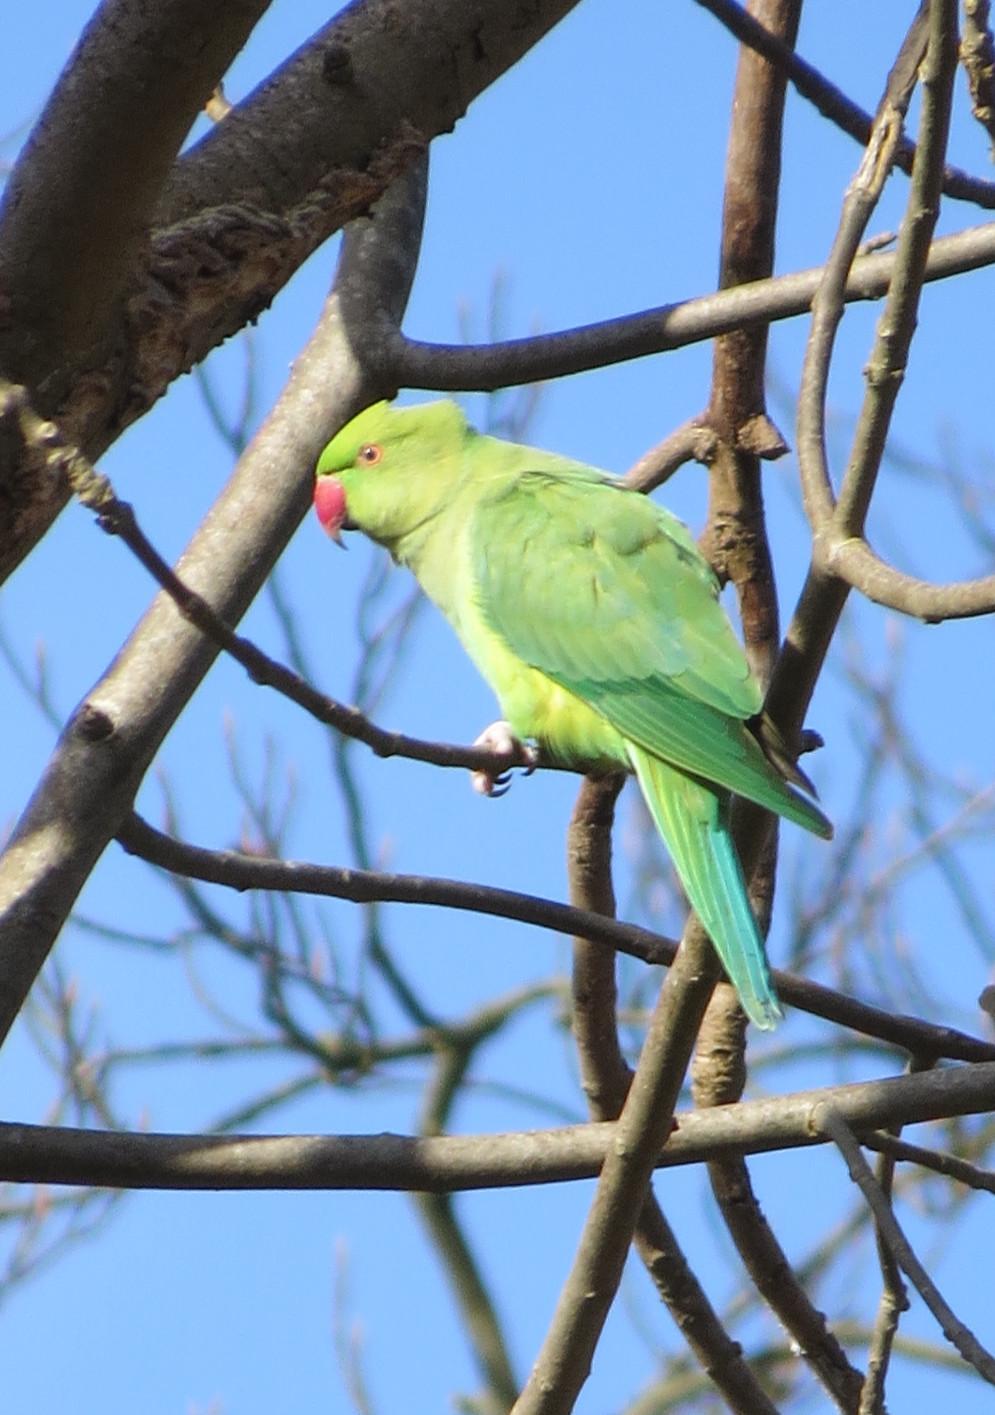 Female parakeet hatched last year, Barbara Copperthwaite, Go Be Wild